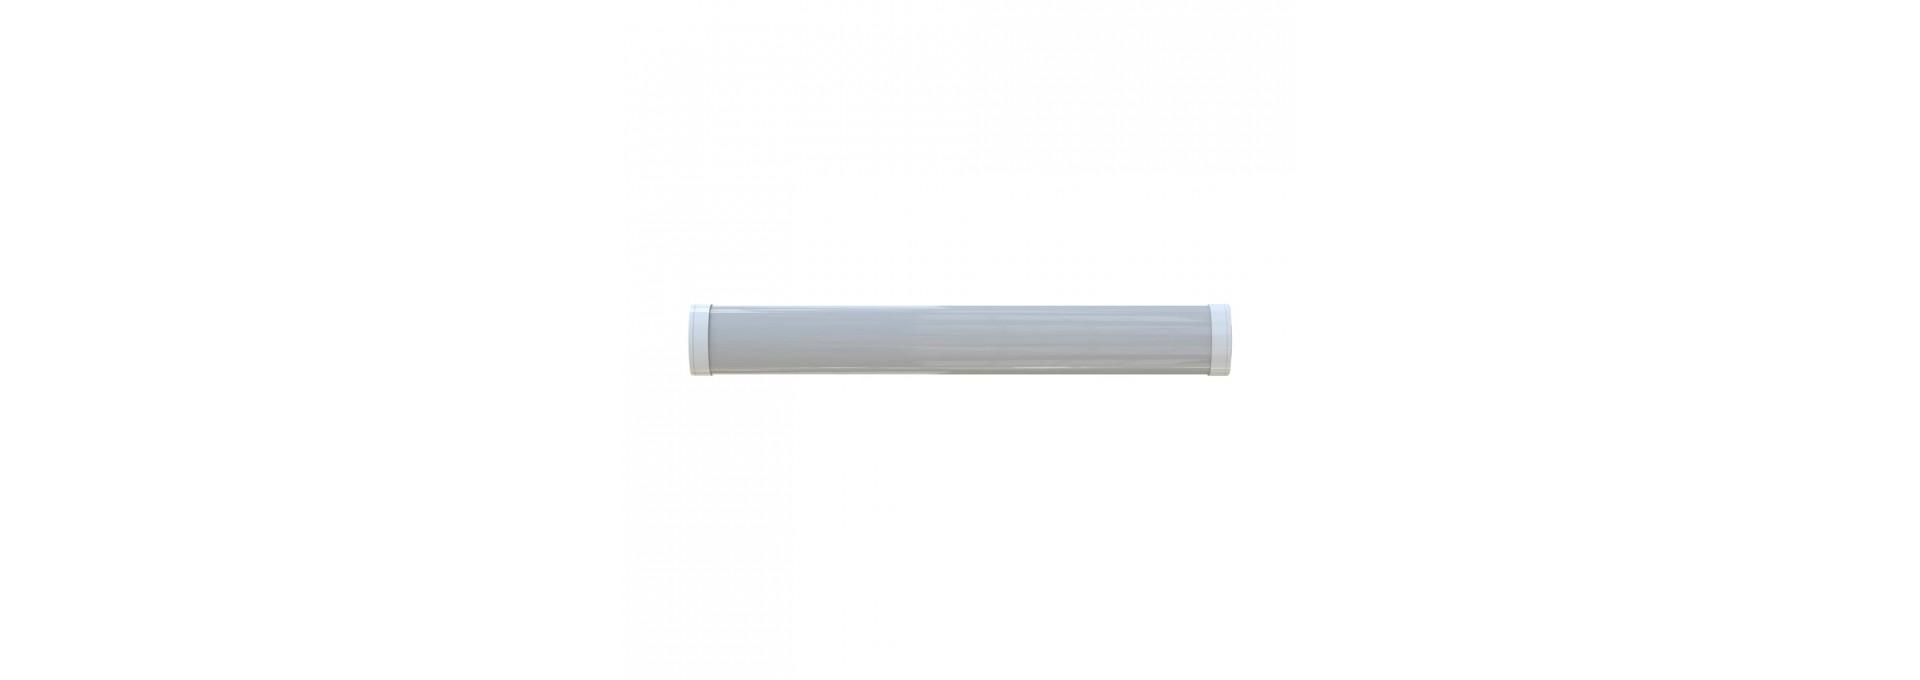 Айсберг v2.0 20 600мм ЭКО 5000К Опал